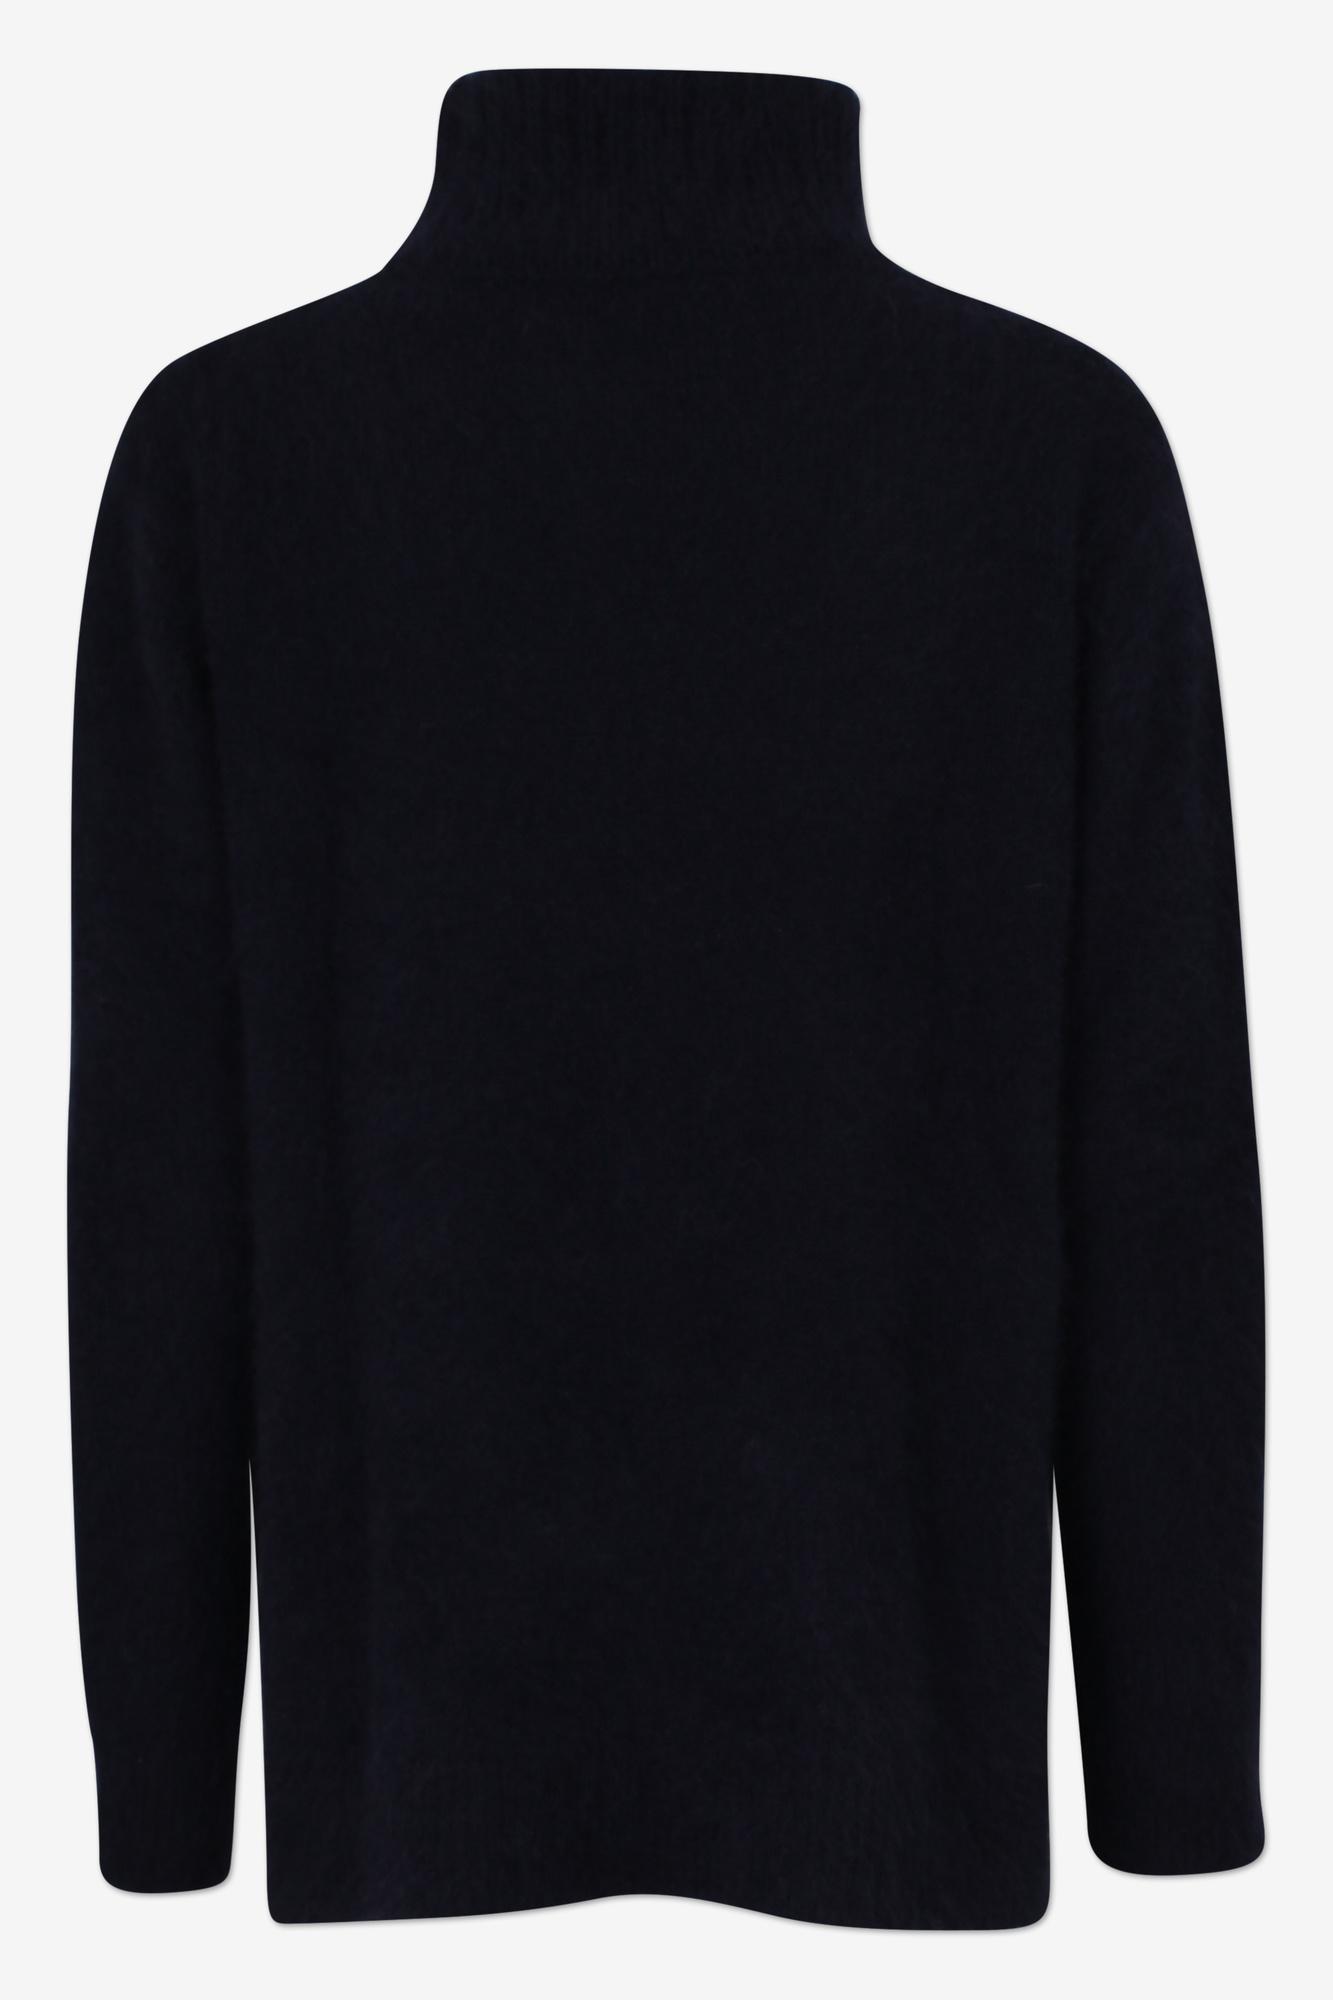 Six Ámes - Jade sweater